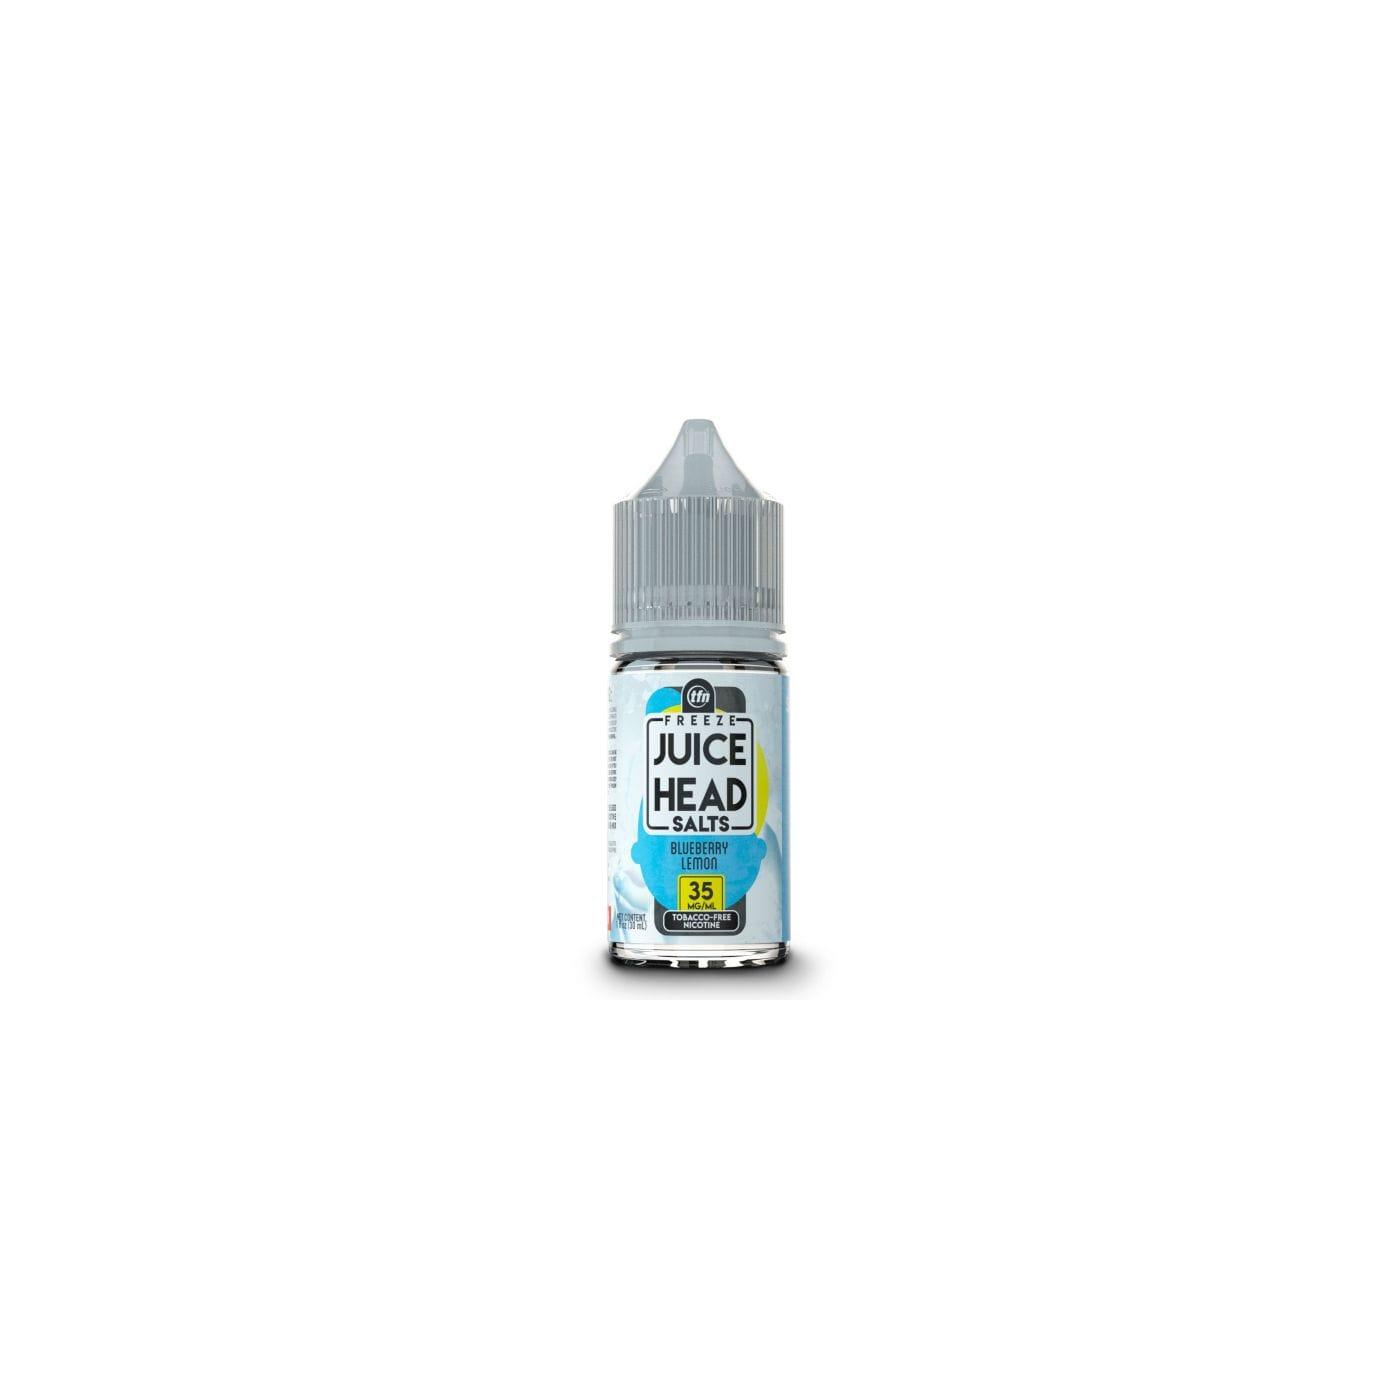 Juice Head TFN Salts Blueberry Lemon Freeze